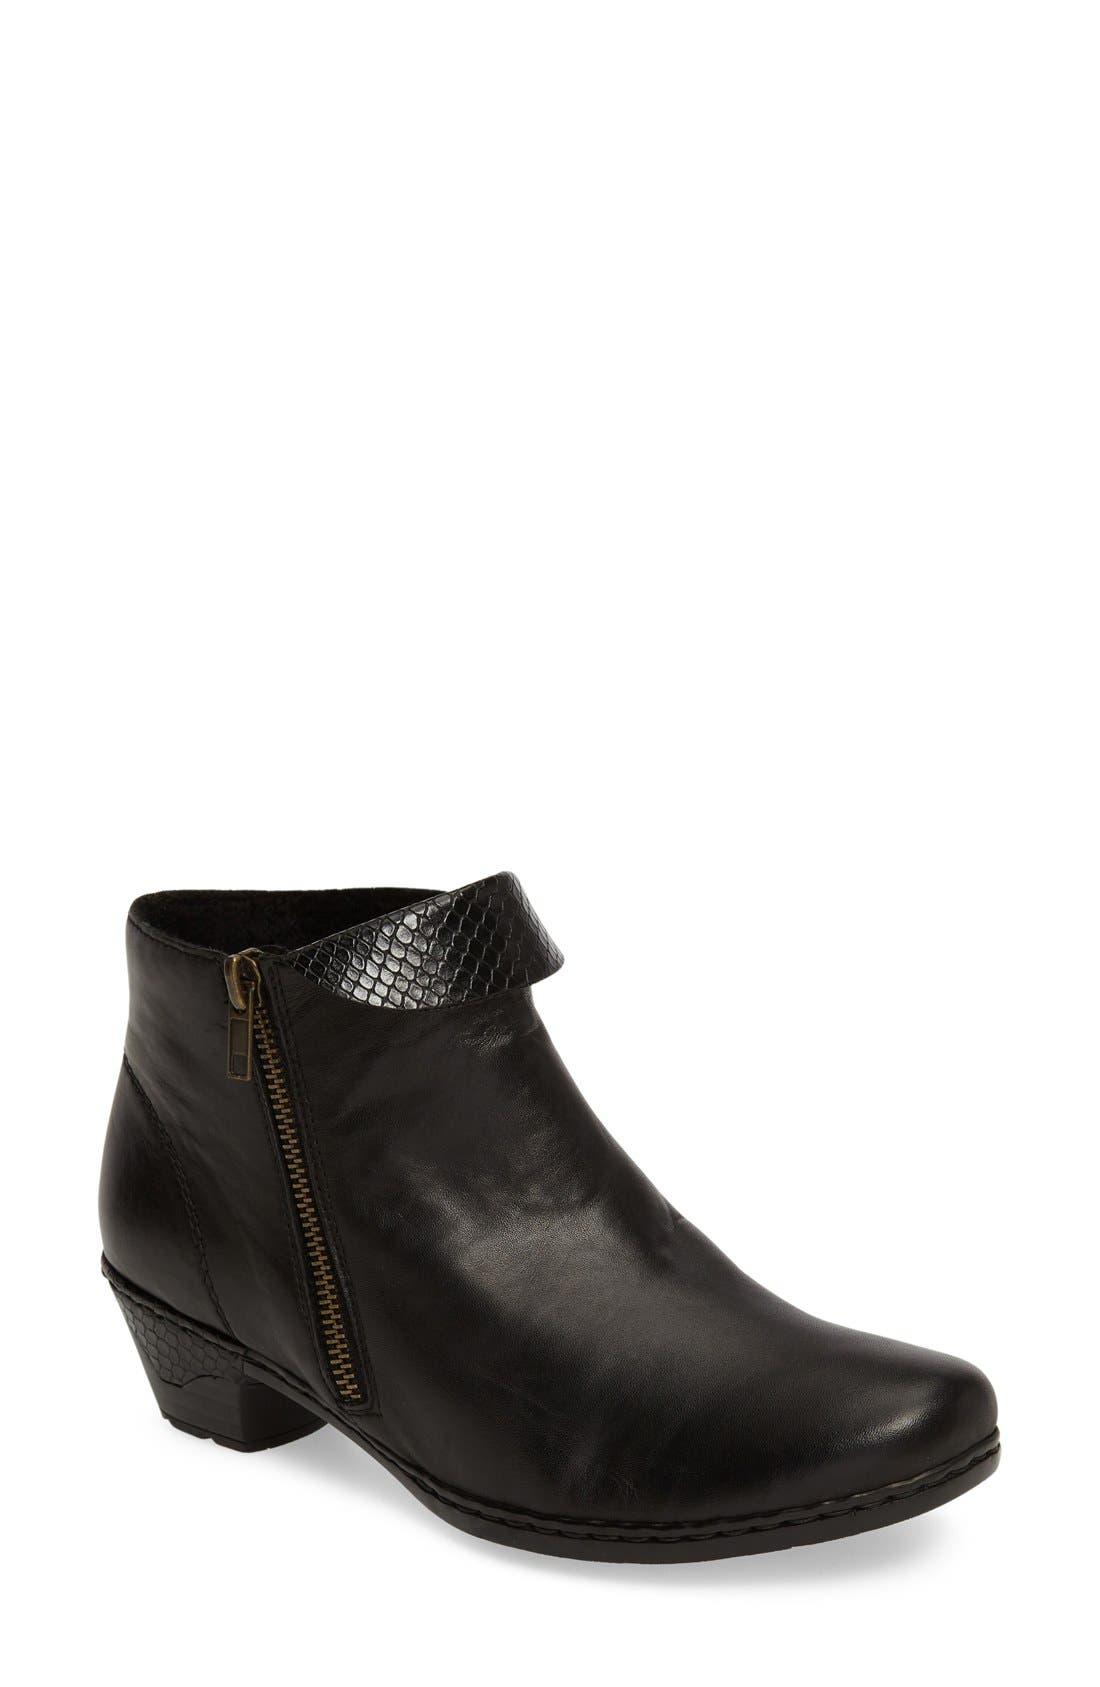 Lynn 61 Bootie,                             Main thumbnail 1, color,                             Black/ Black Leather